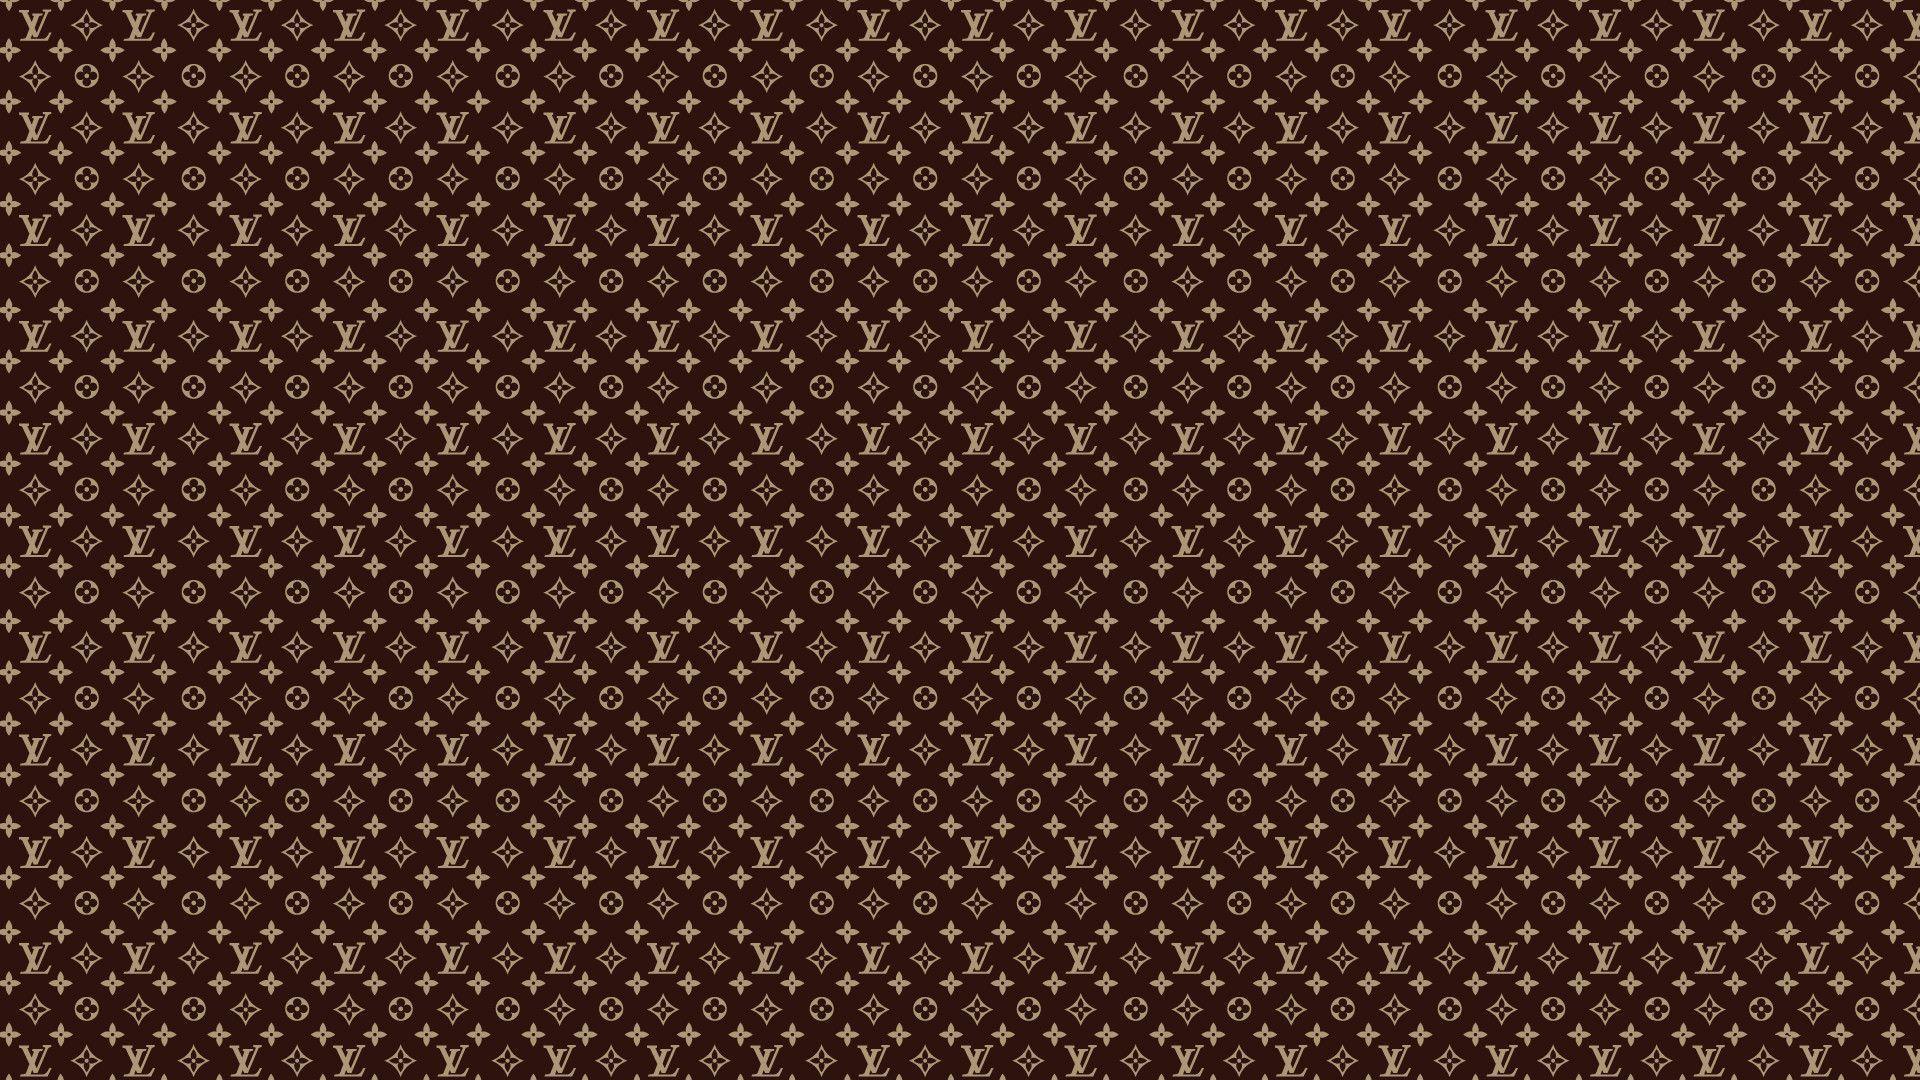 Louis Vuitton Gucci Wallpapers Top Free Louis Vuitton Gucci